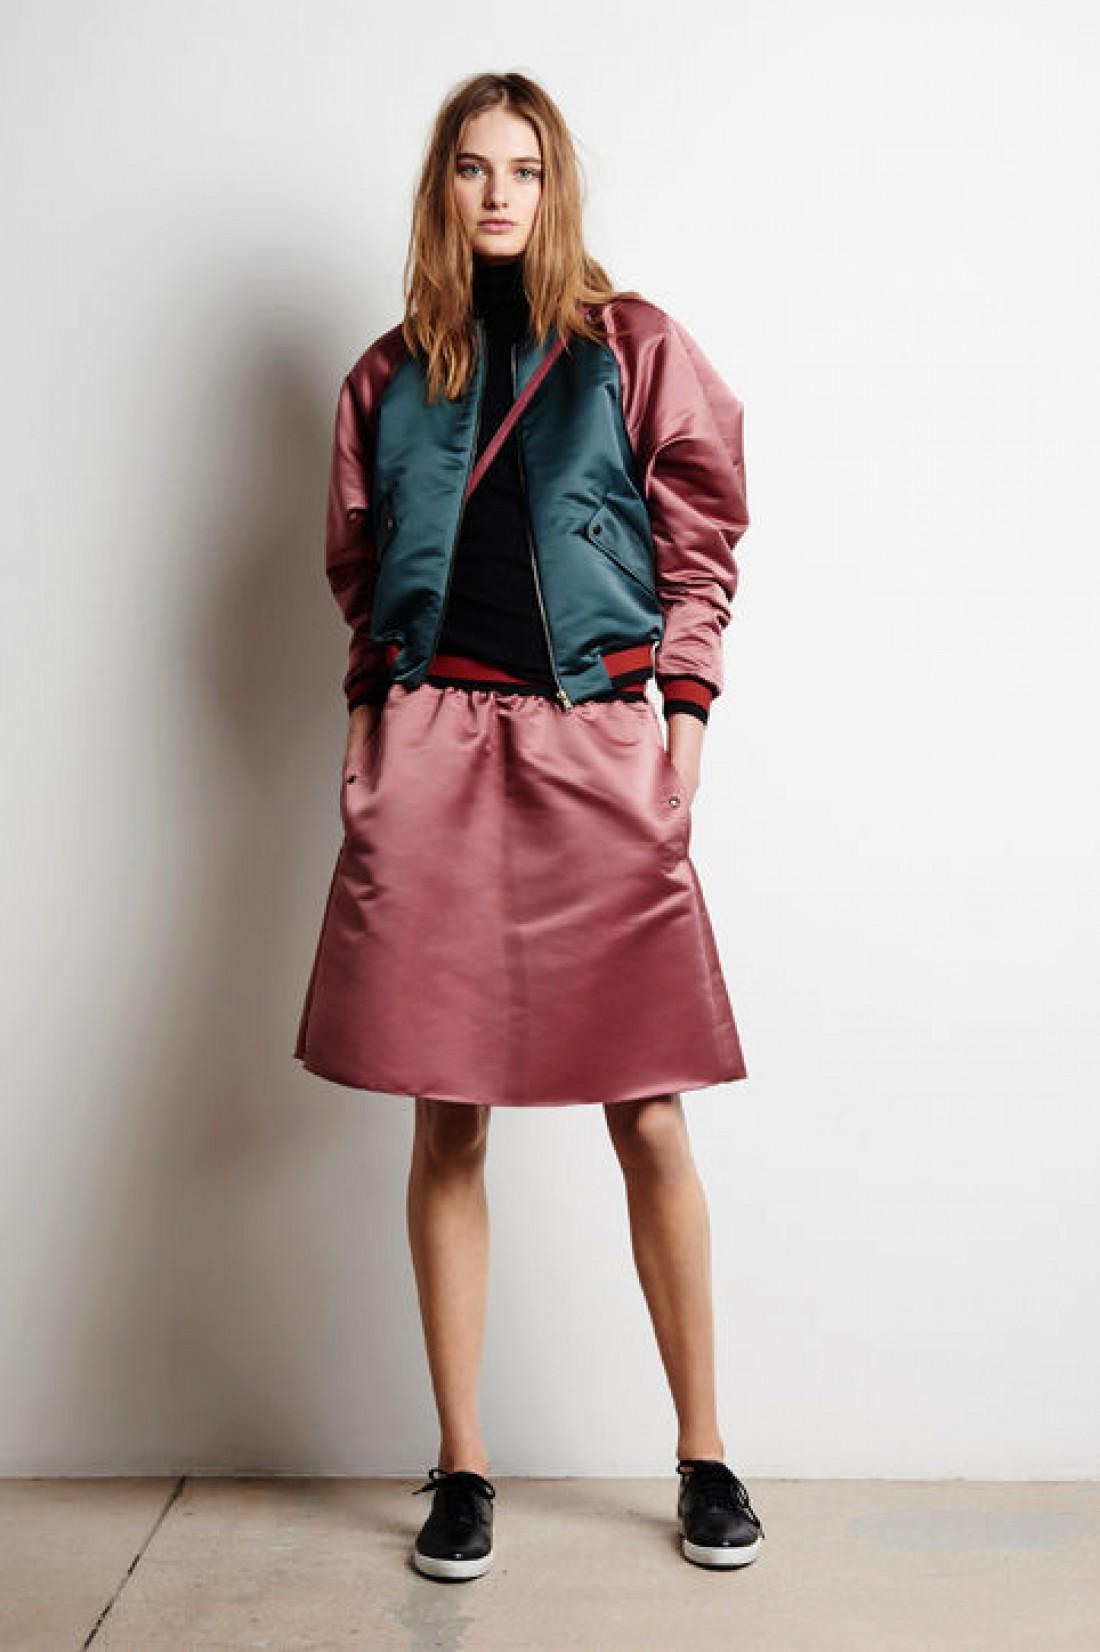 9ea8a213f83 Тренд 2016 года  Куртка-бомпер - Тренды моды